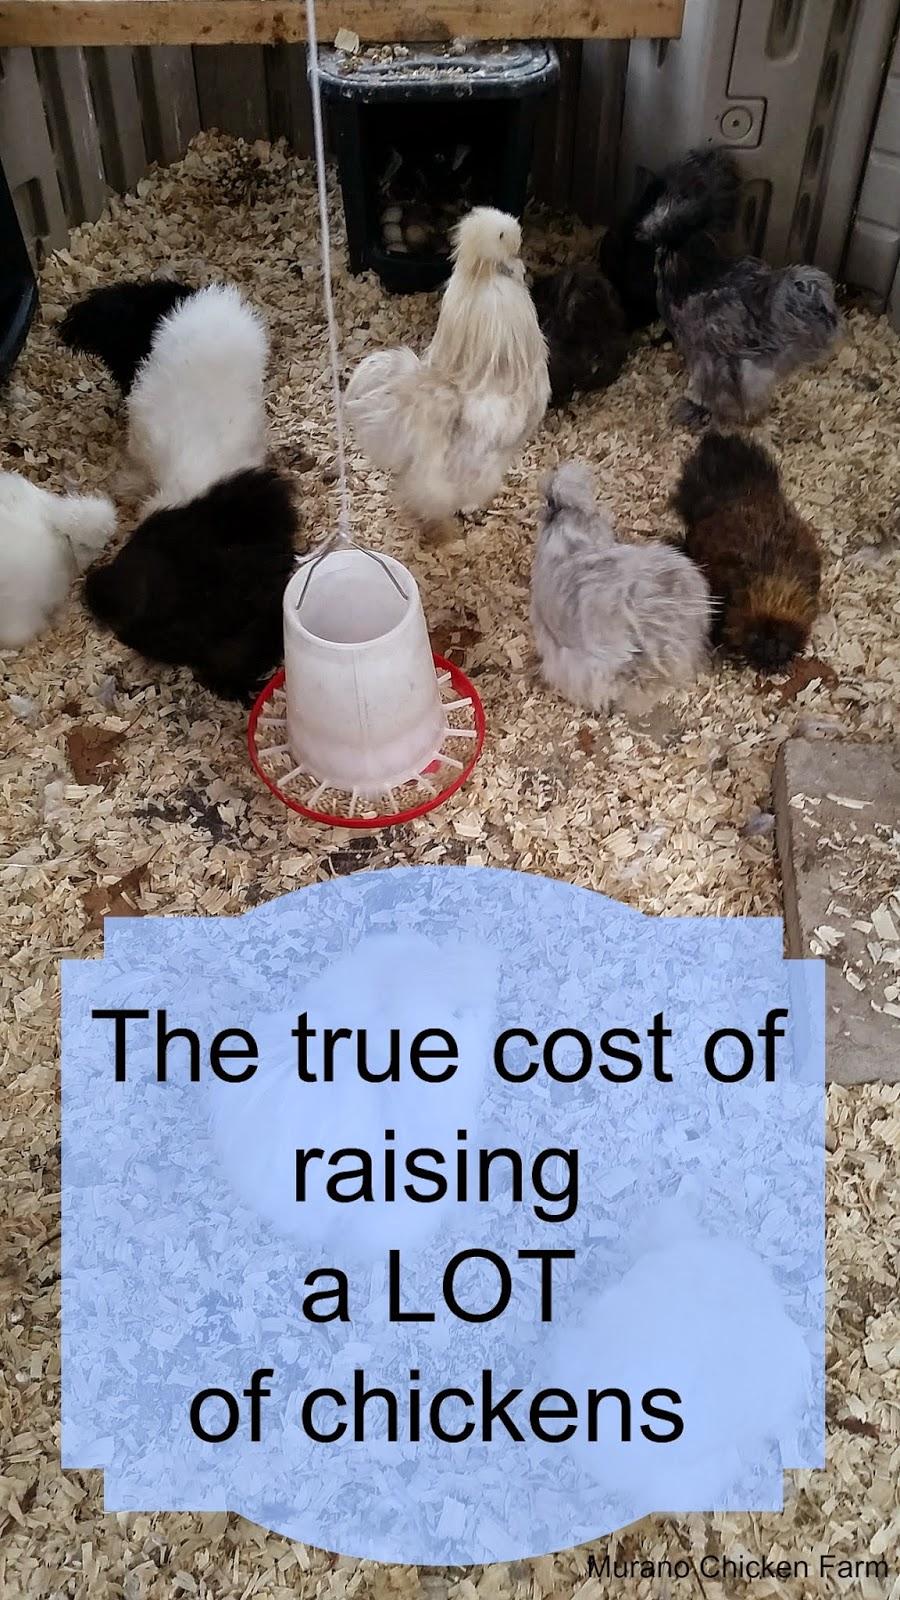 The true cost of raising chickens